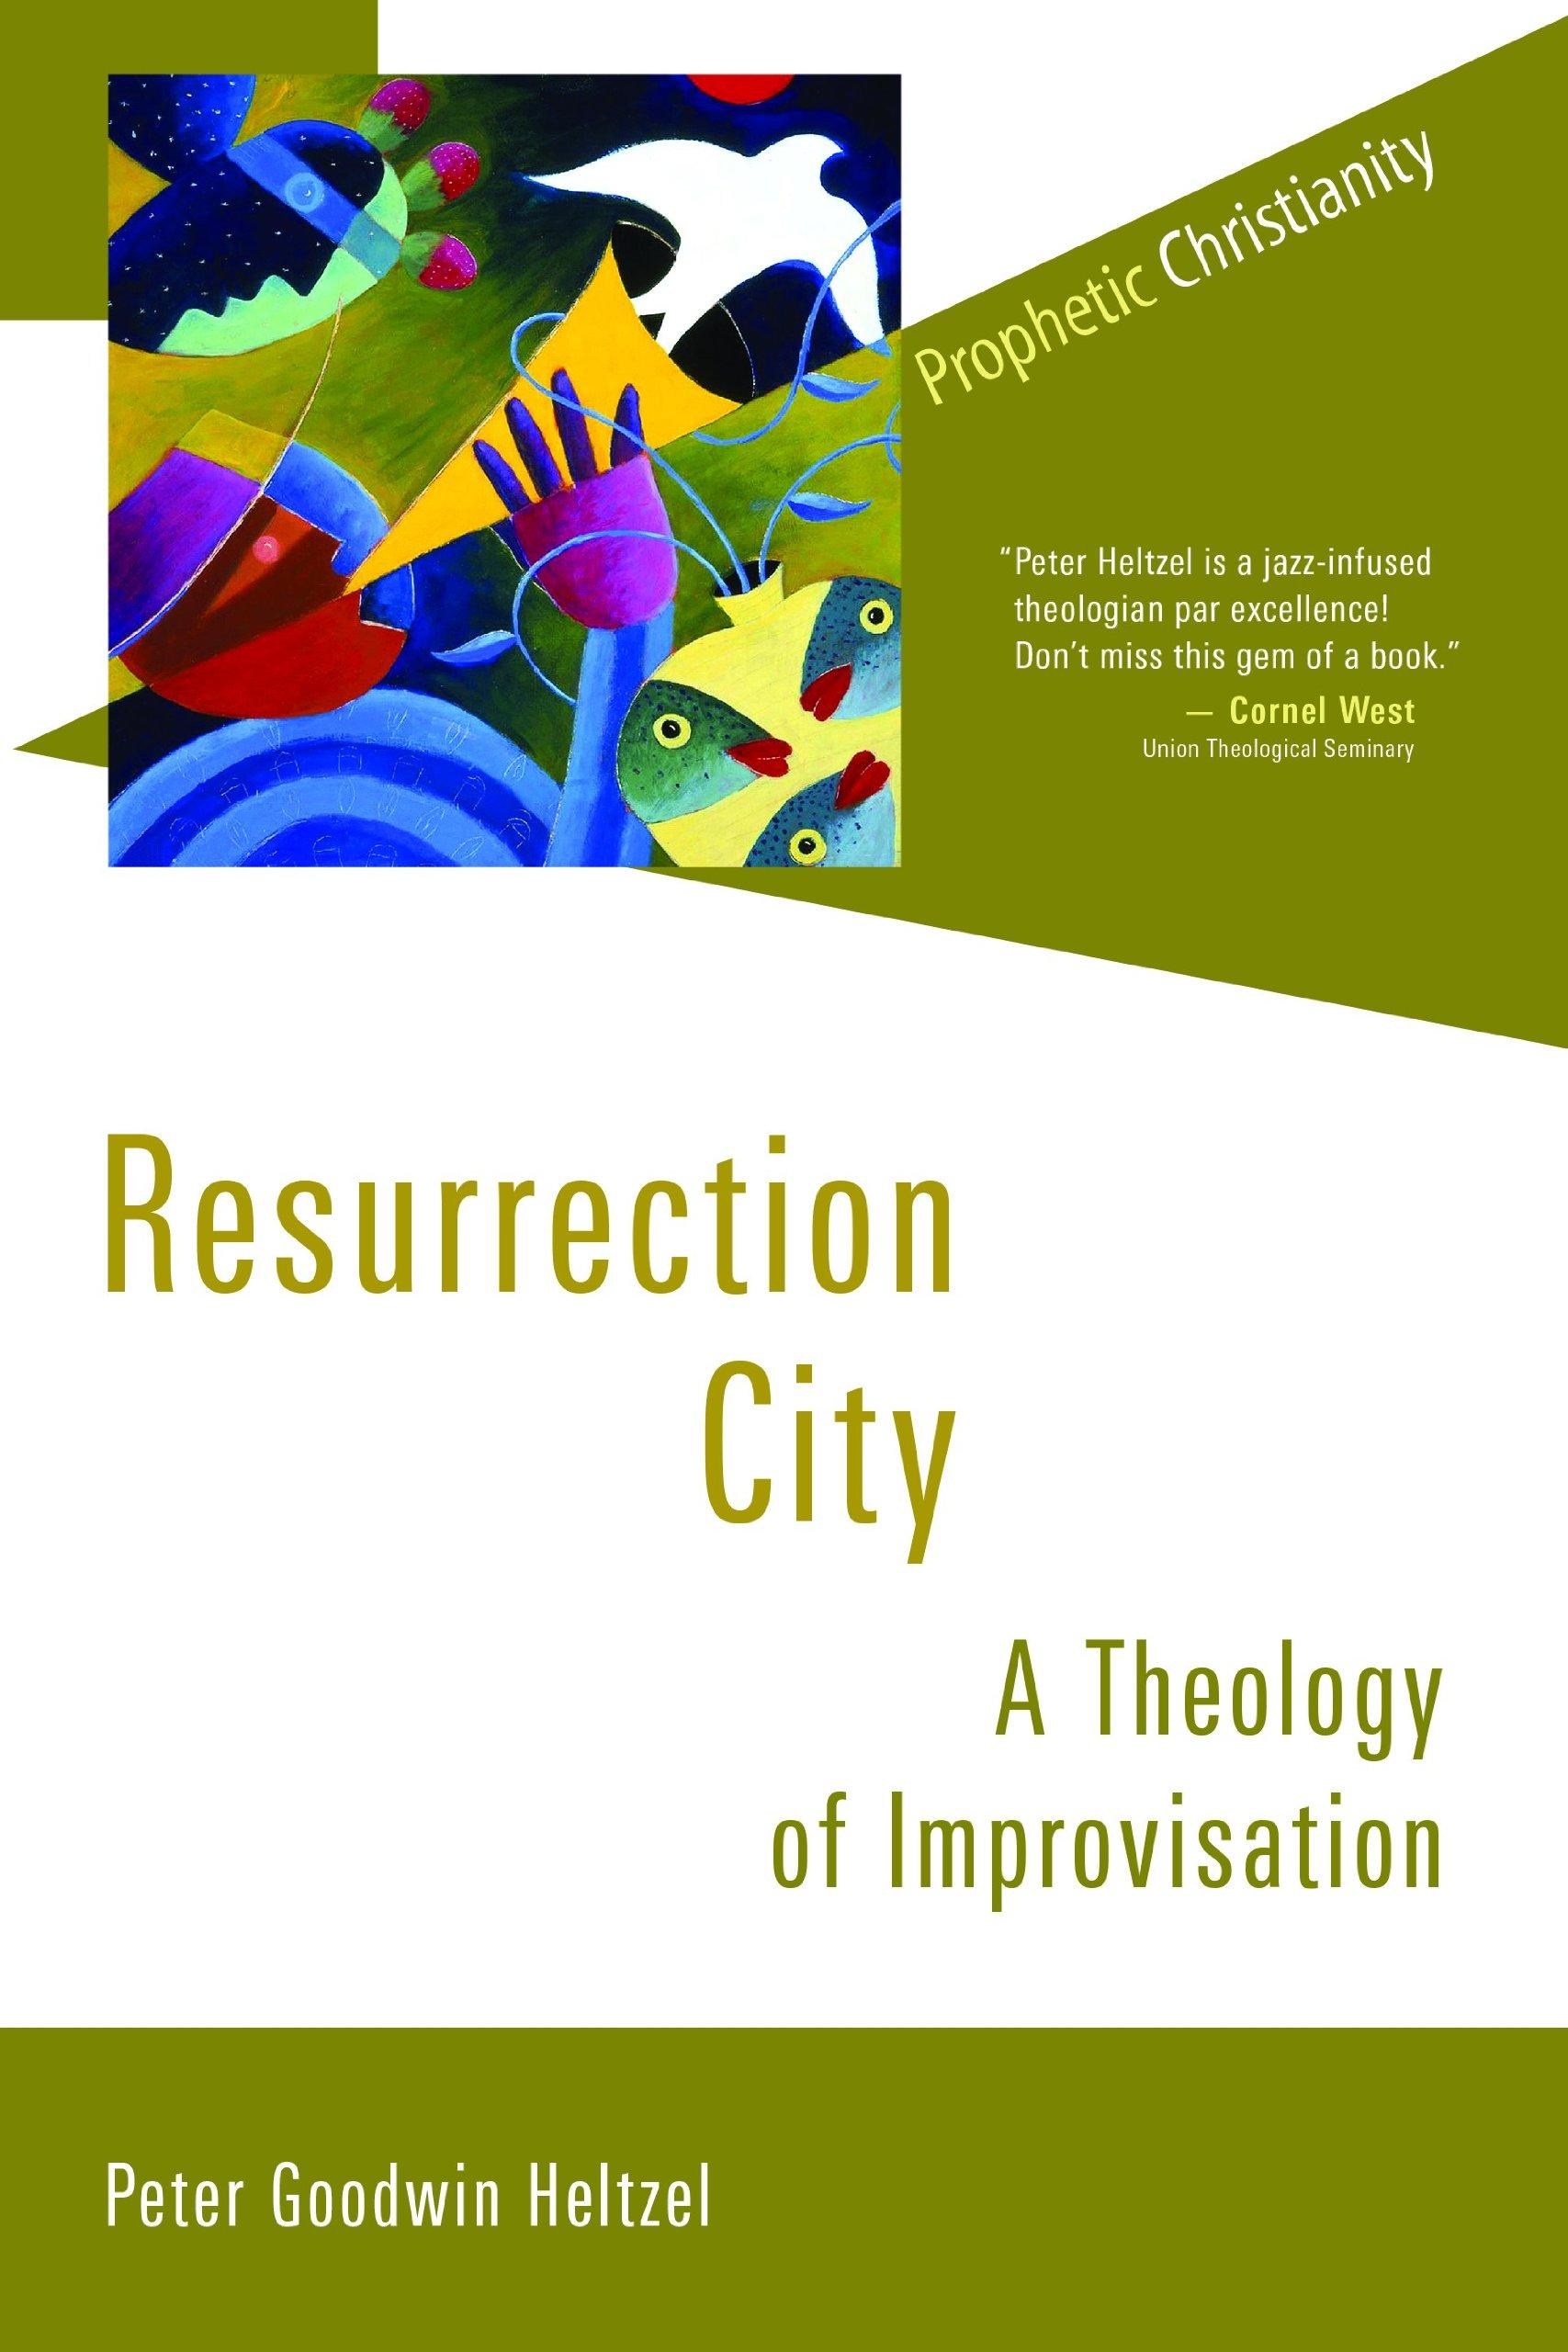 Book review: Resurrection City